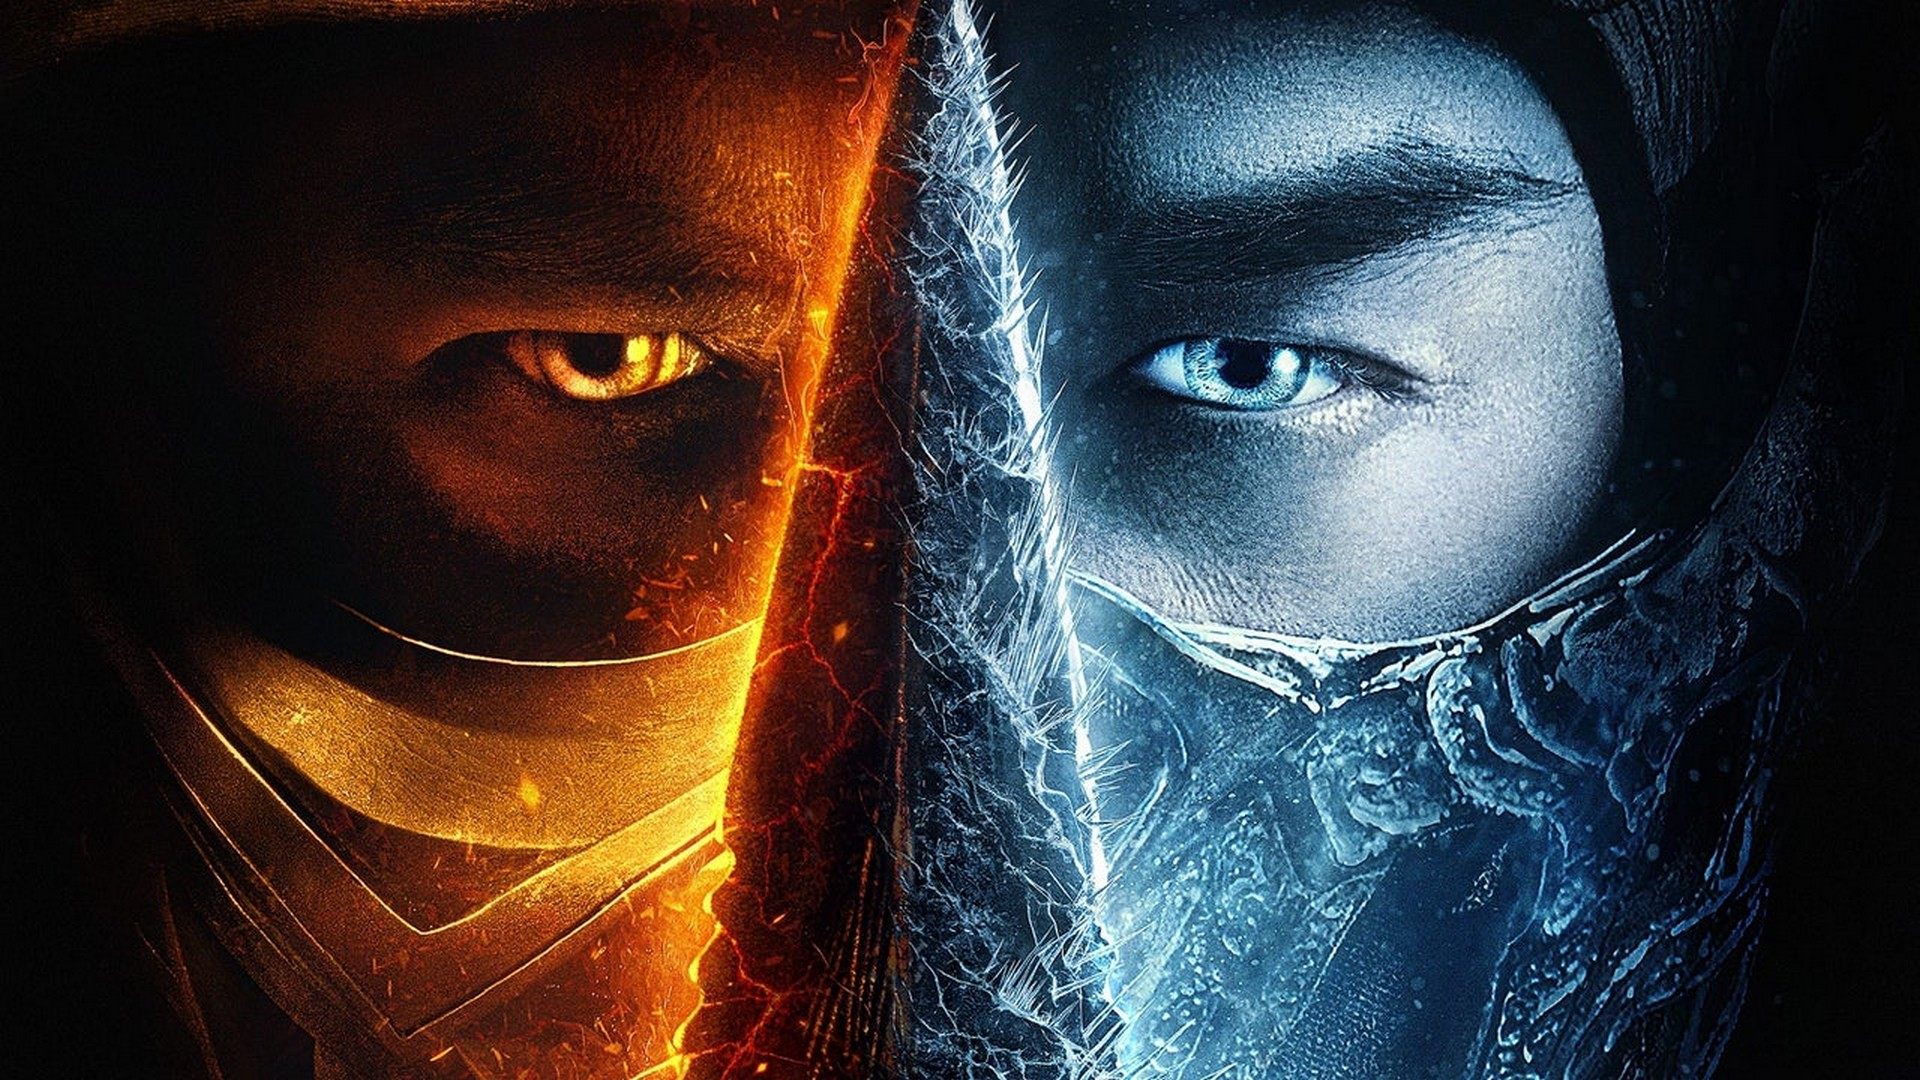 Mortal Kombat Official Trailer Launch – In Australian Cinemas On 15th April 2021